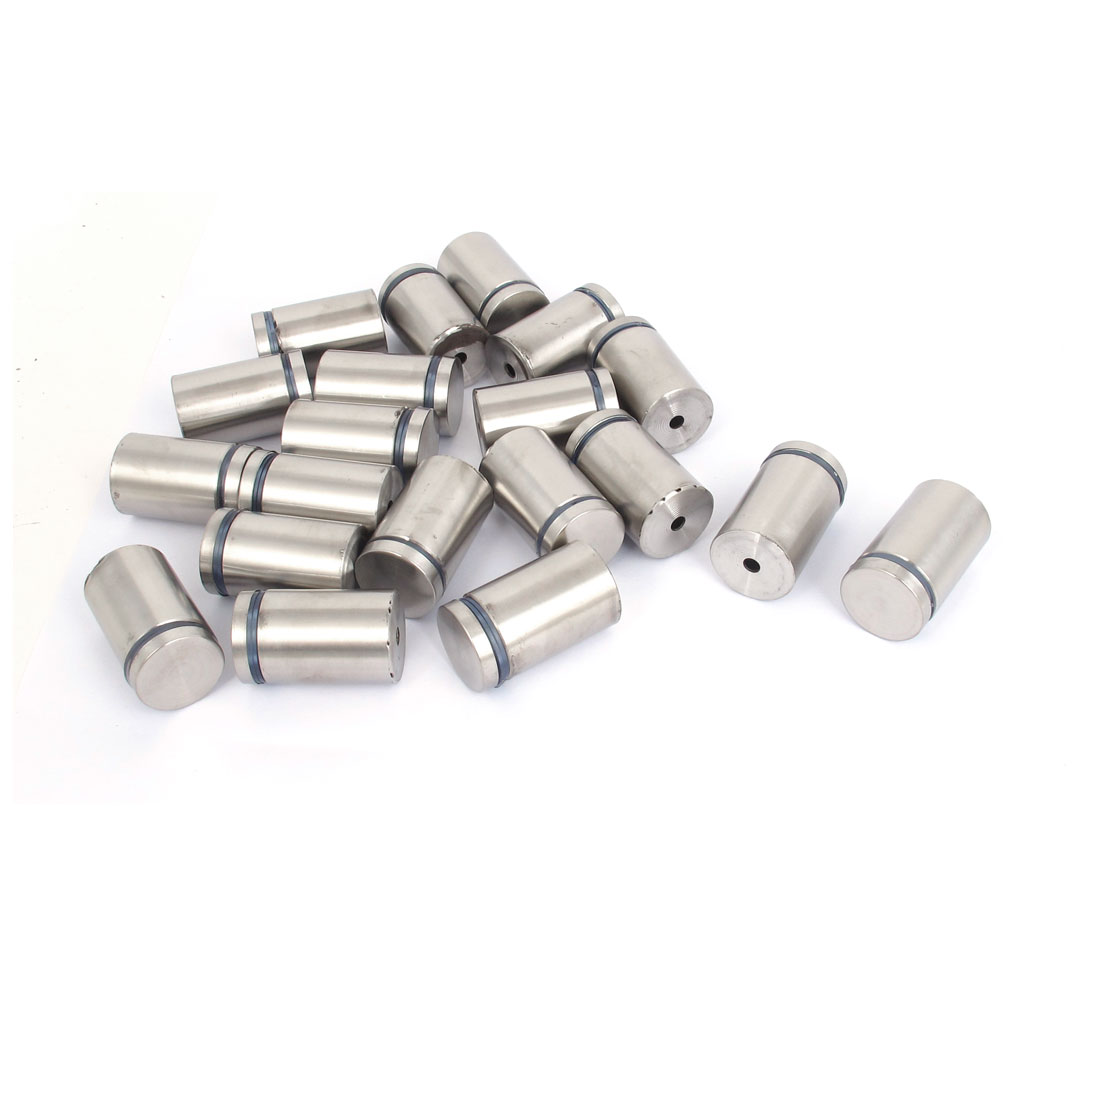 25mm x 40mm Stainless Steel Advertising Frameless Glass Standoff Pins 20pcs